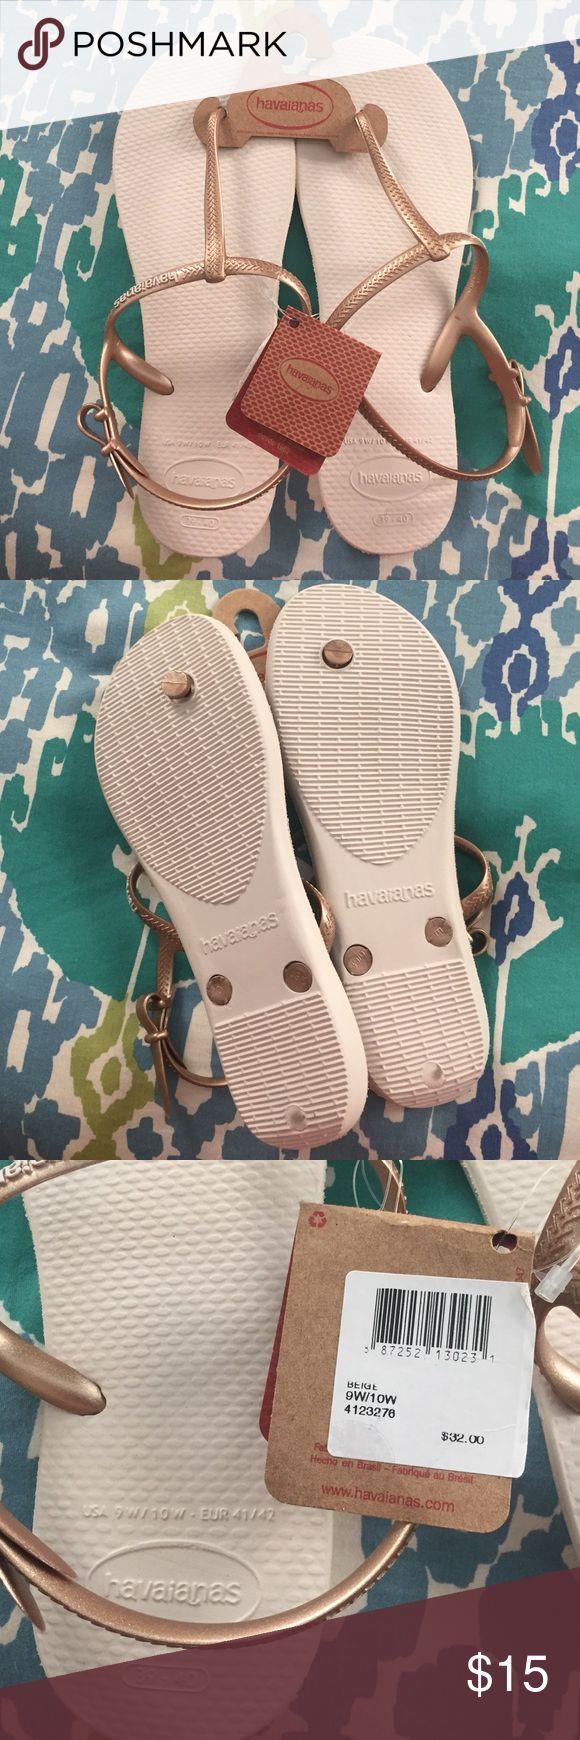 Havaianas Freedom Flip Flops Havaianas Freedom flip flops. Size 9W/10W (39-40) Havaianas Shoes Sandals